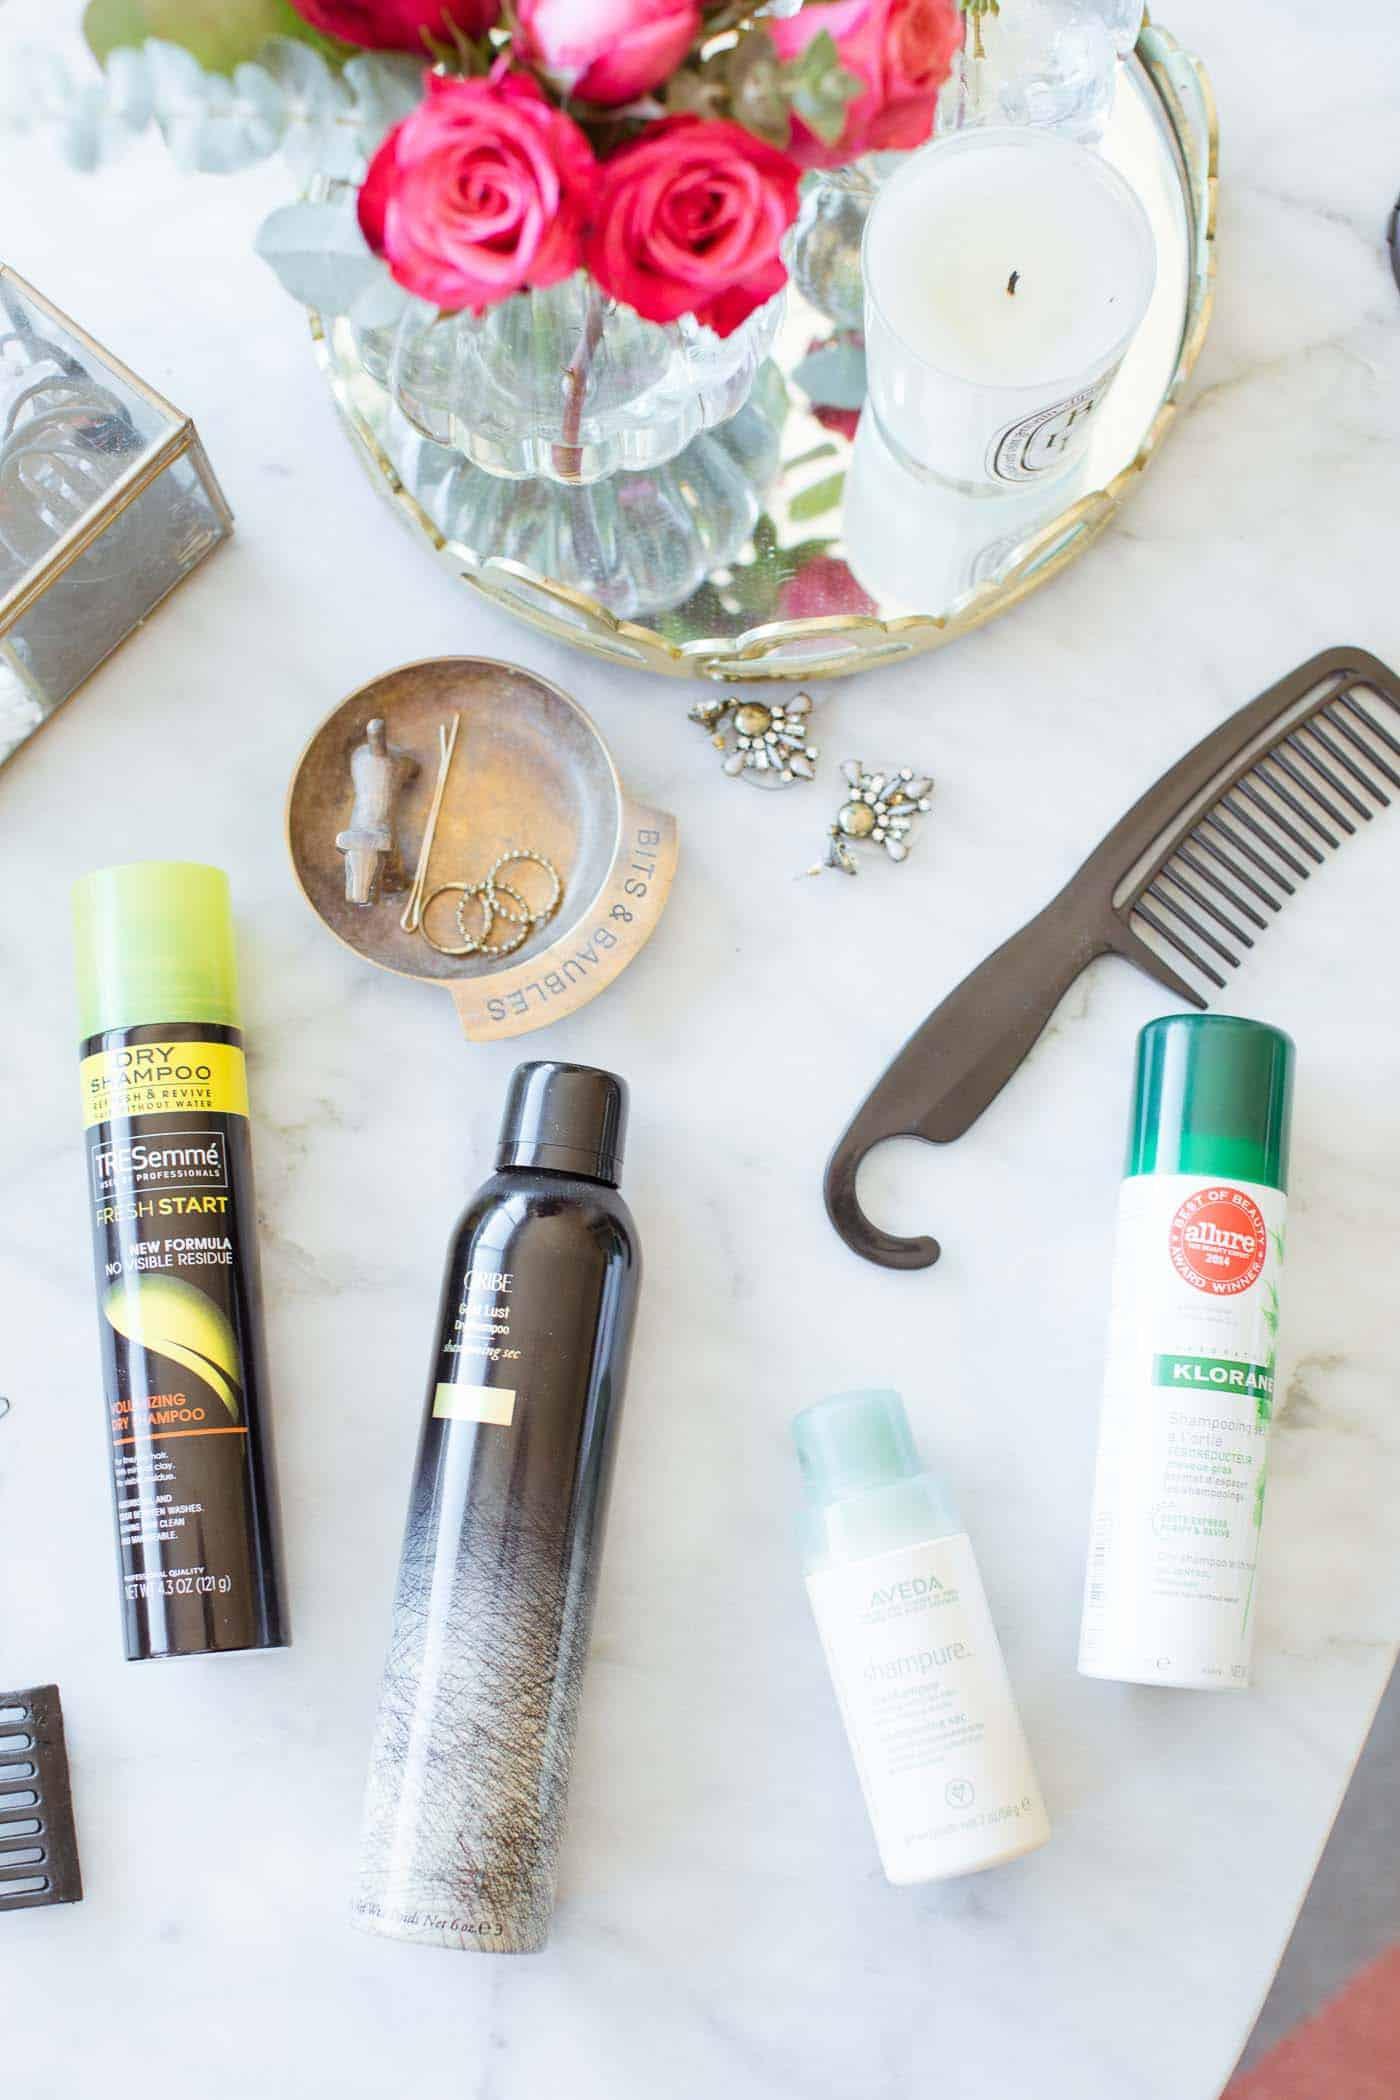 Best dry shampoos at every price point - My Style Vita @mystylevita